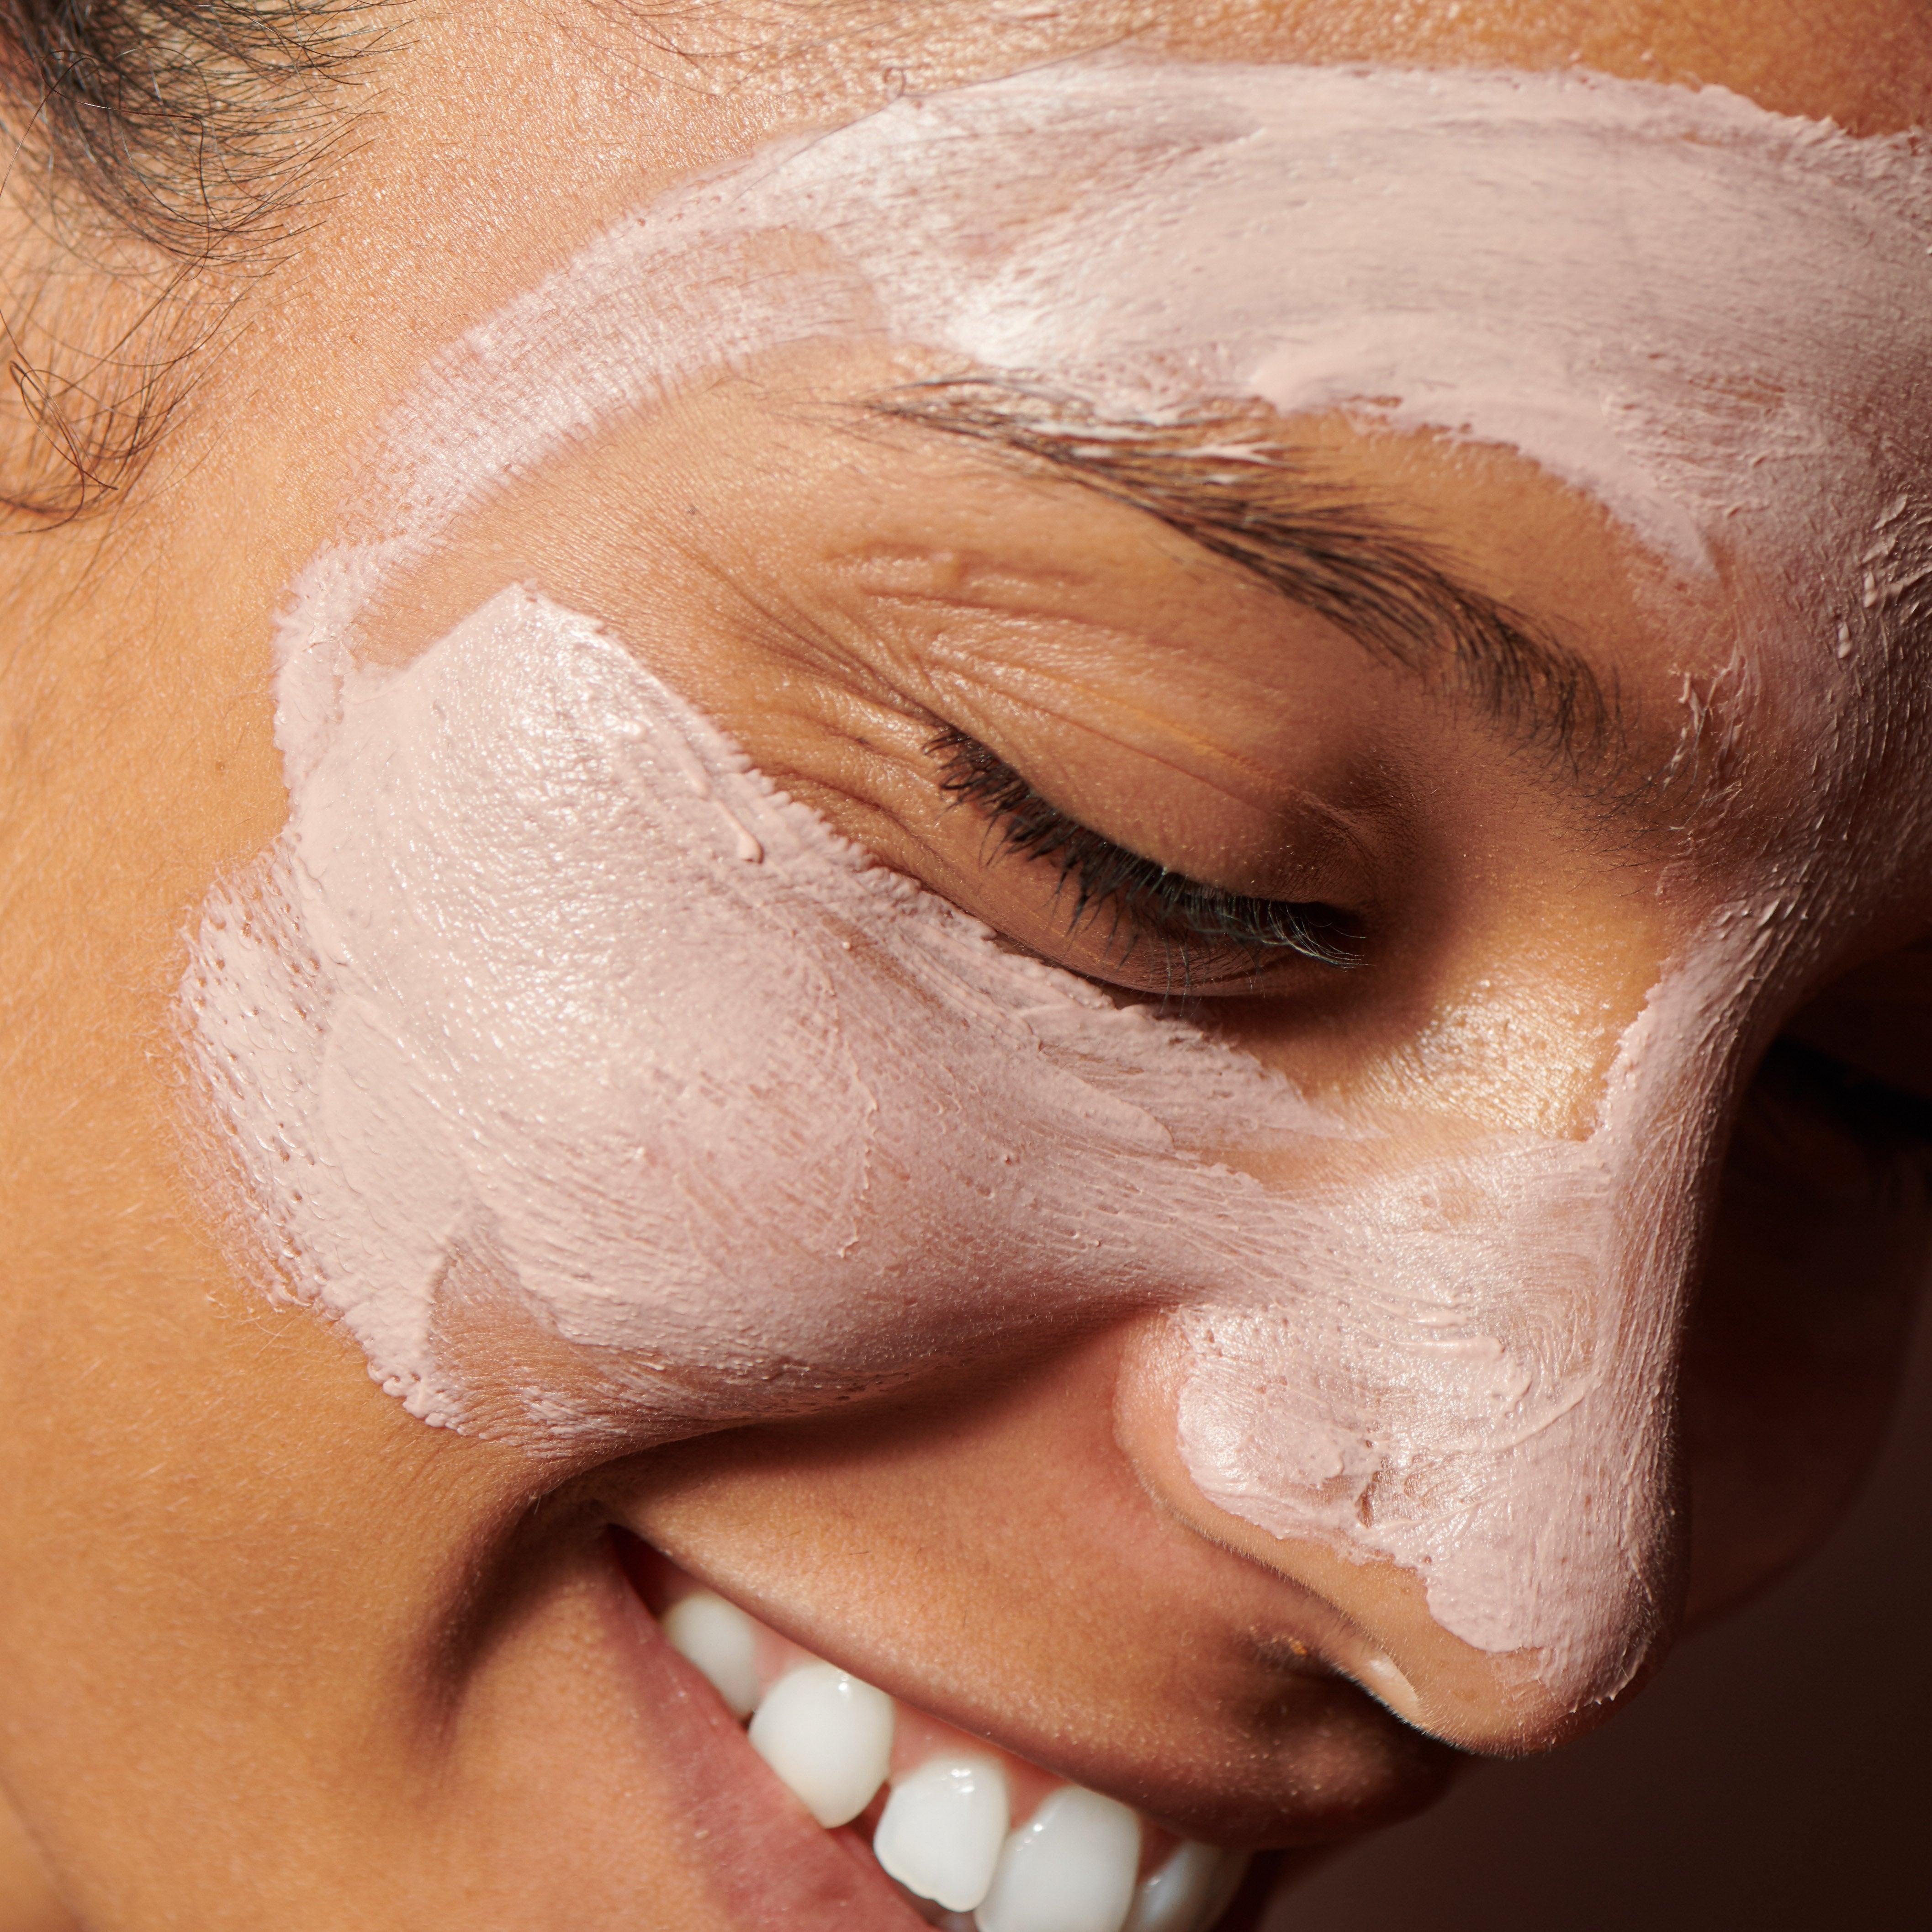 Onekind Pore-fectionist Refining Facial